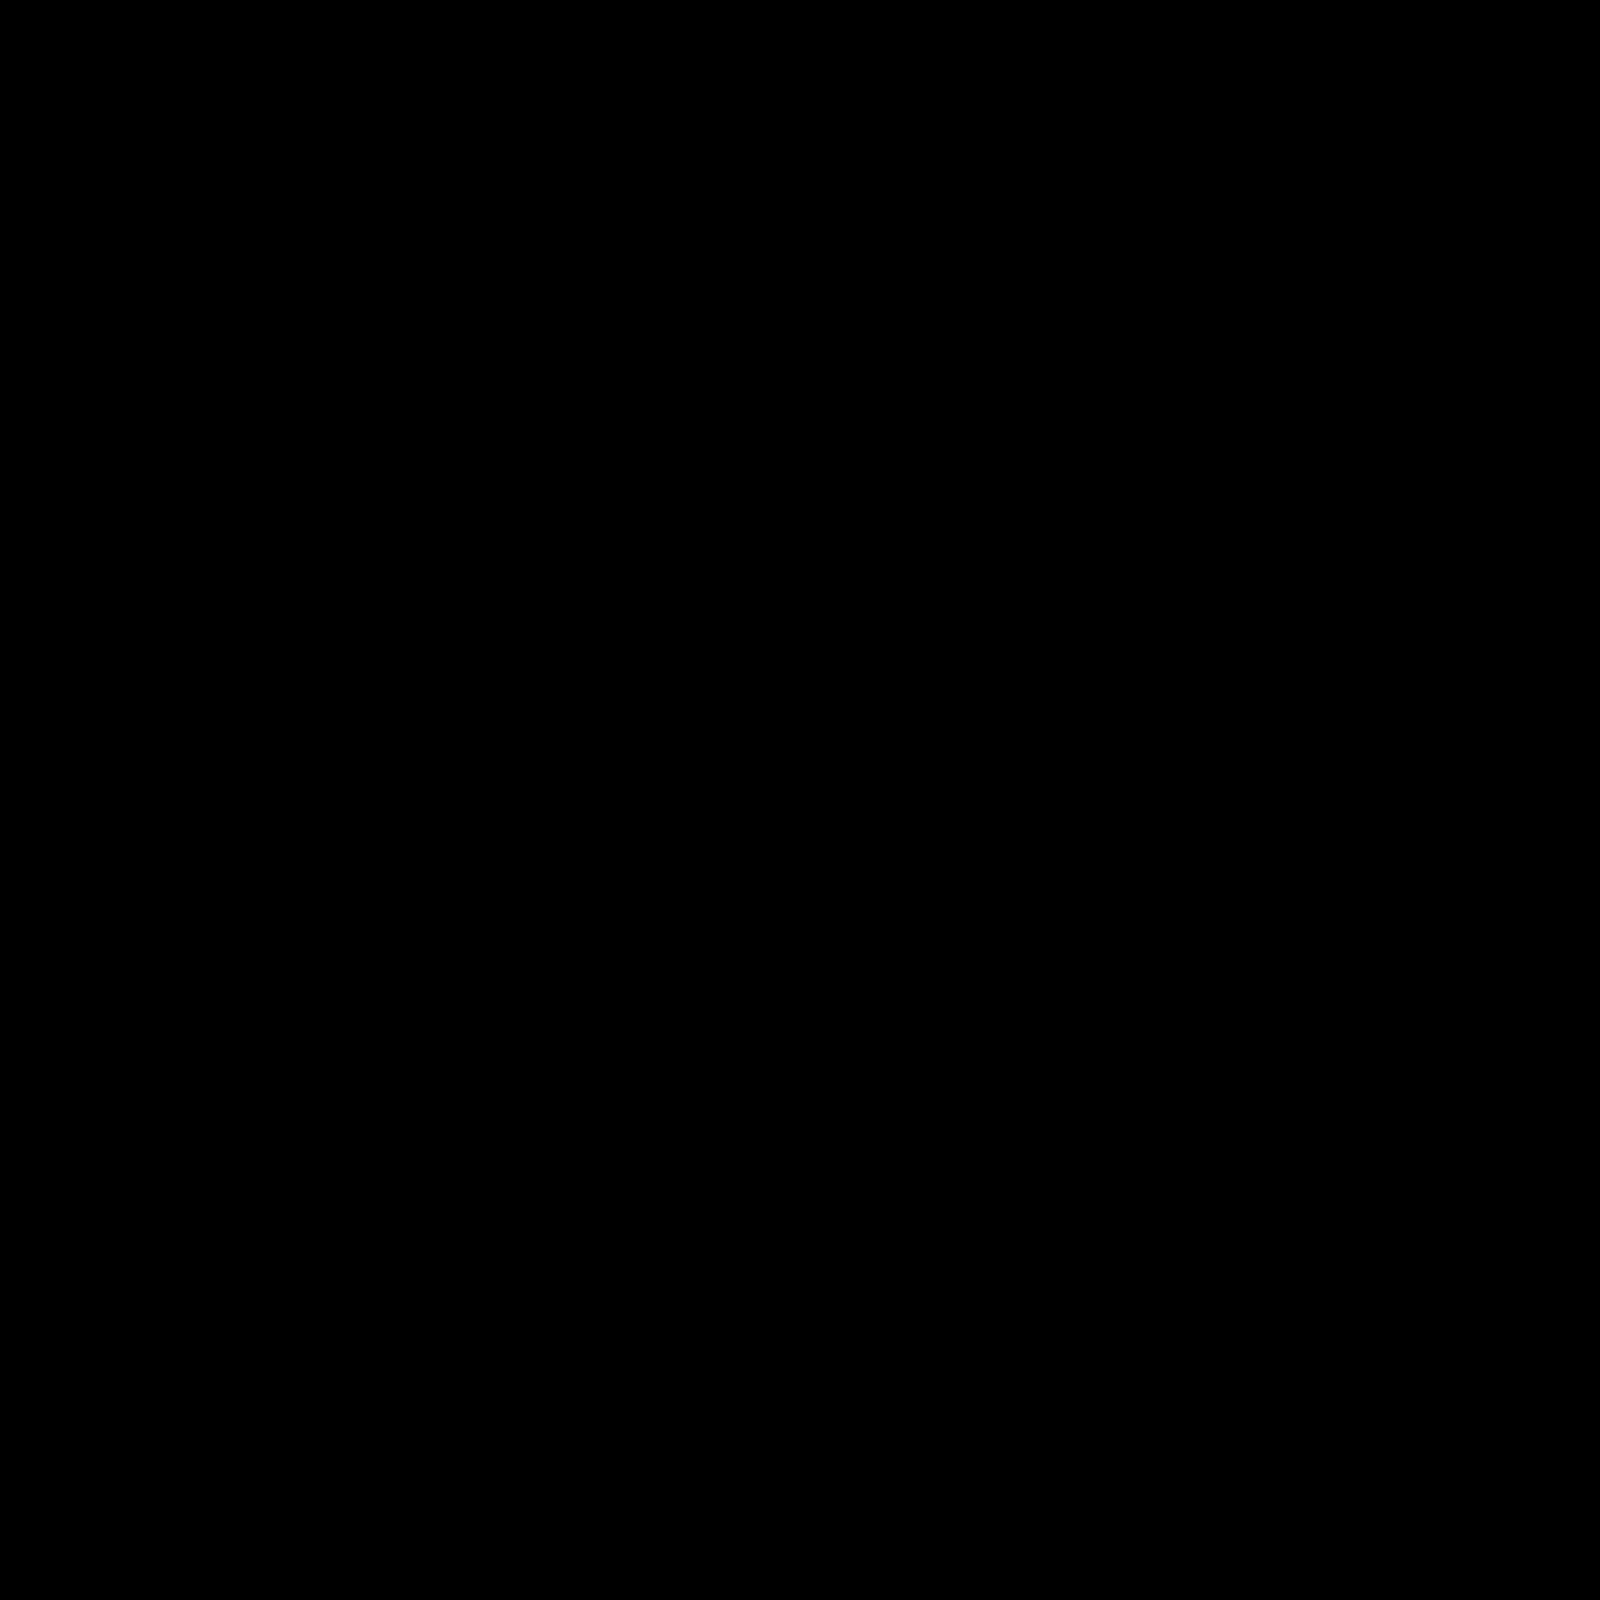 Таблетки icon